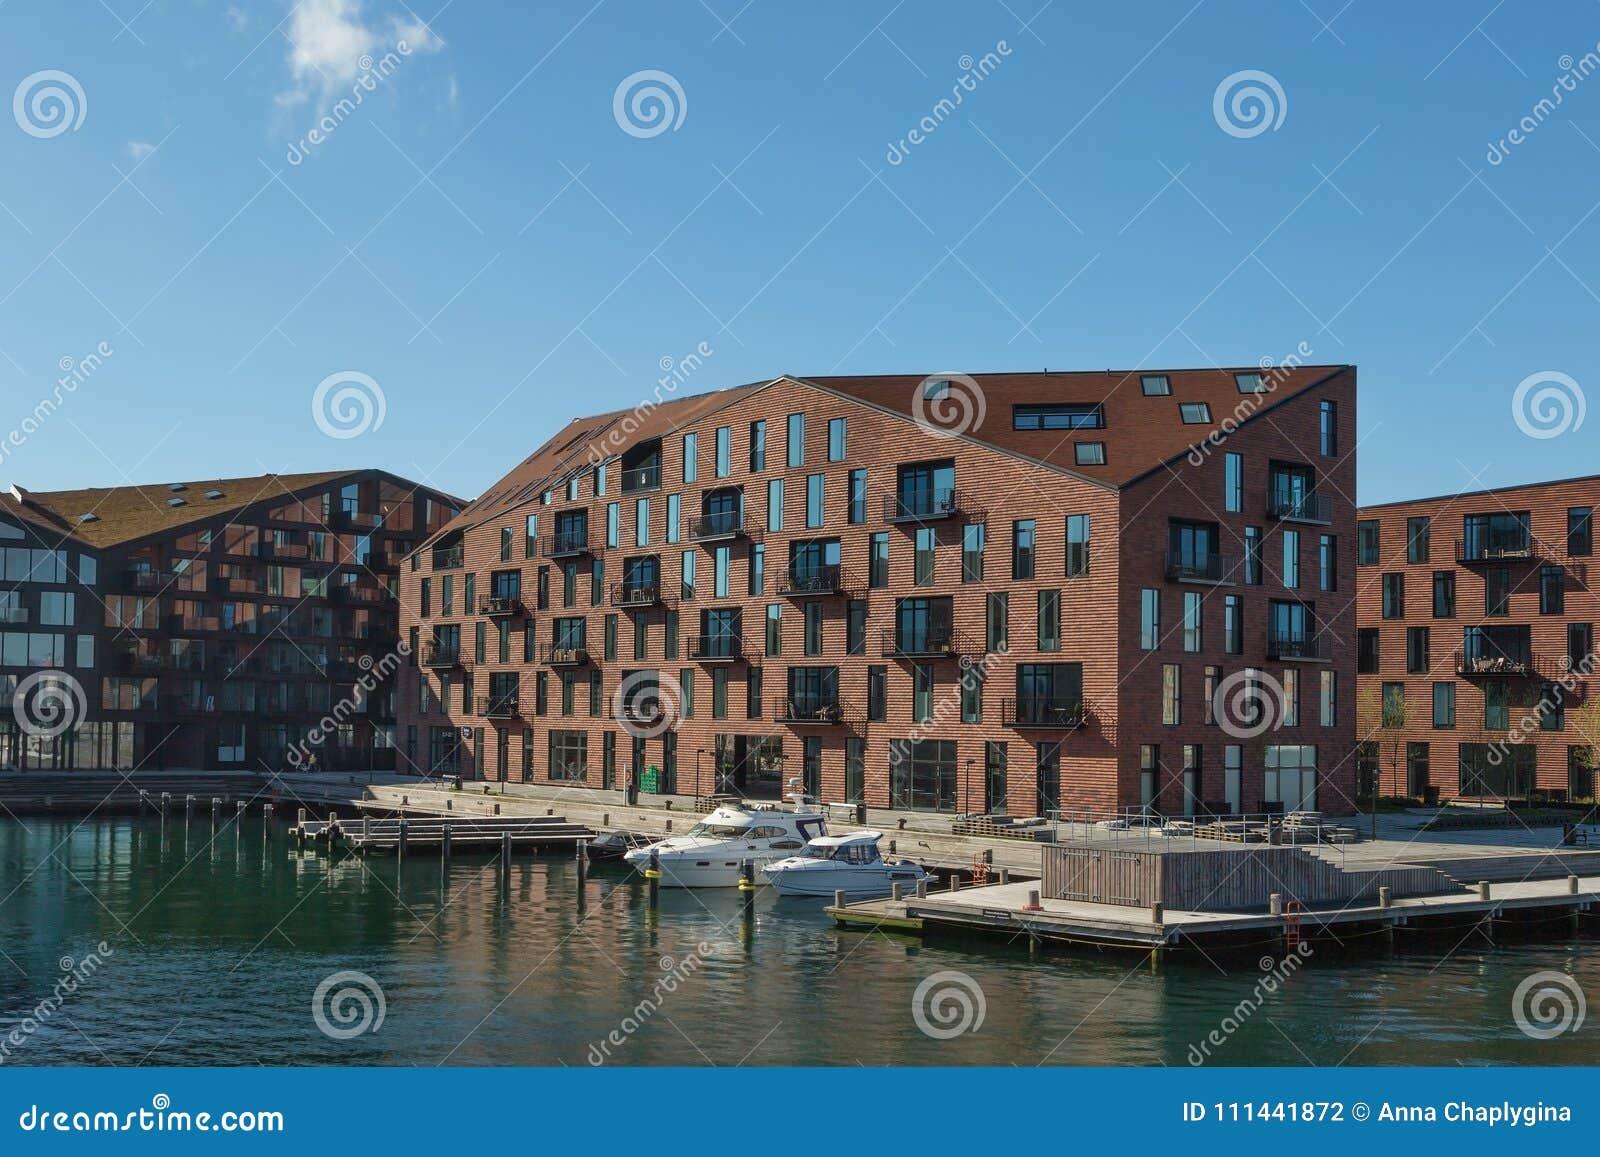 COPENHAGUE, DANEMARK - 30 AVRIL 2017 : Bord de mer de Christiansha